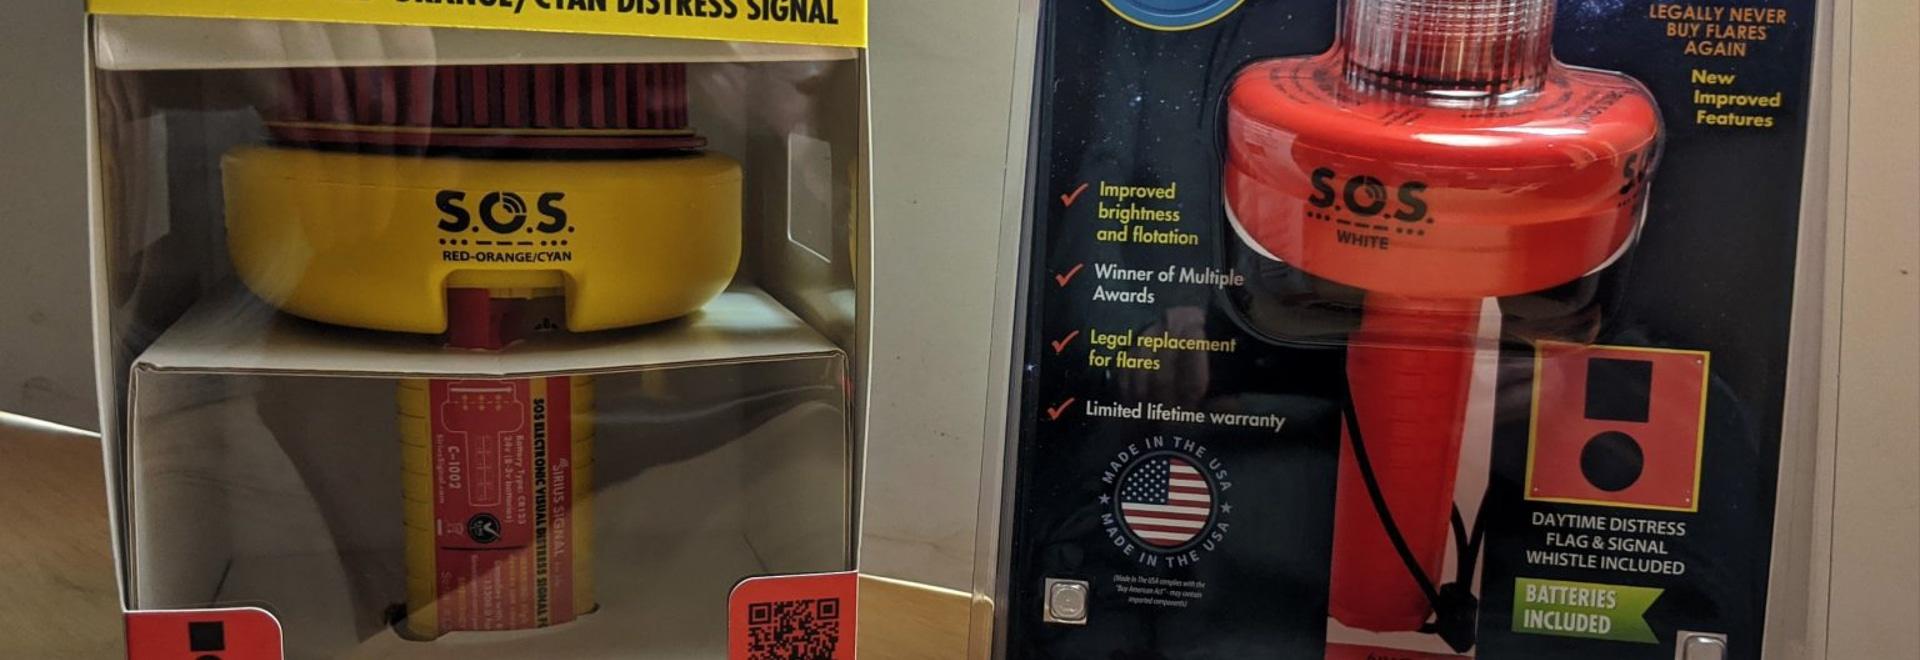 Sirius Signal C-1002 & C-1003 SOS distress signal testing begins, future bright